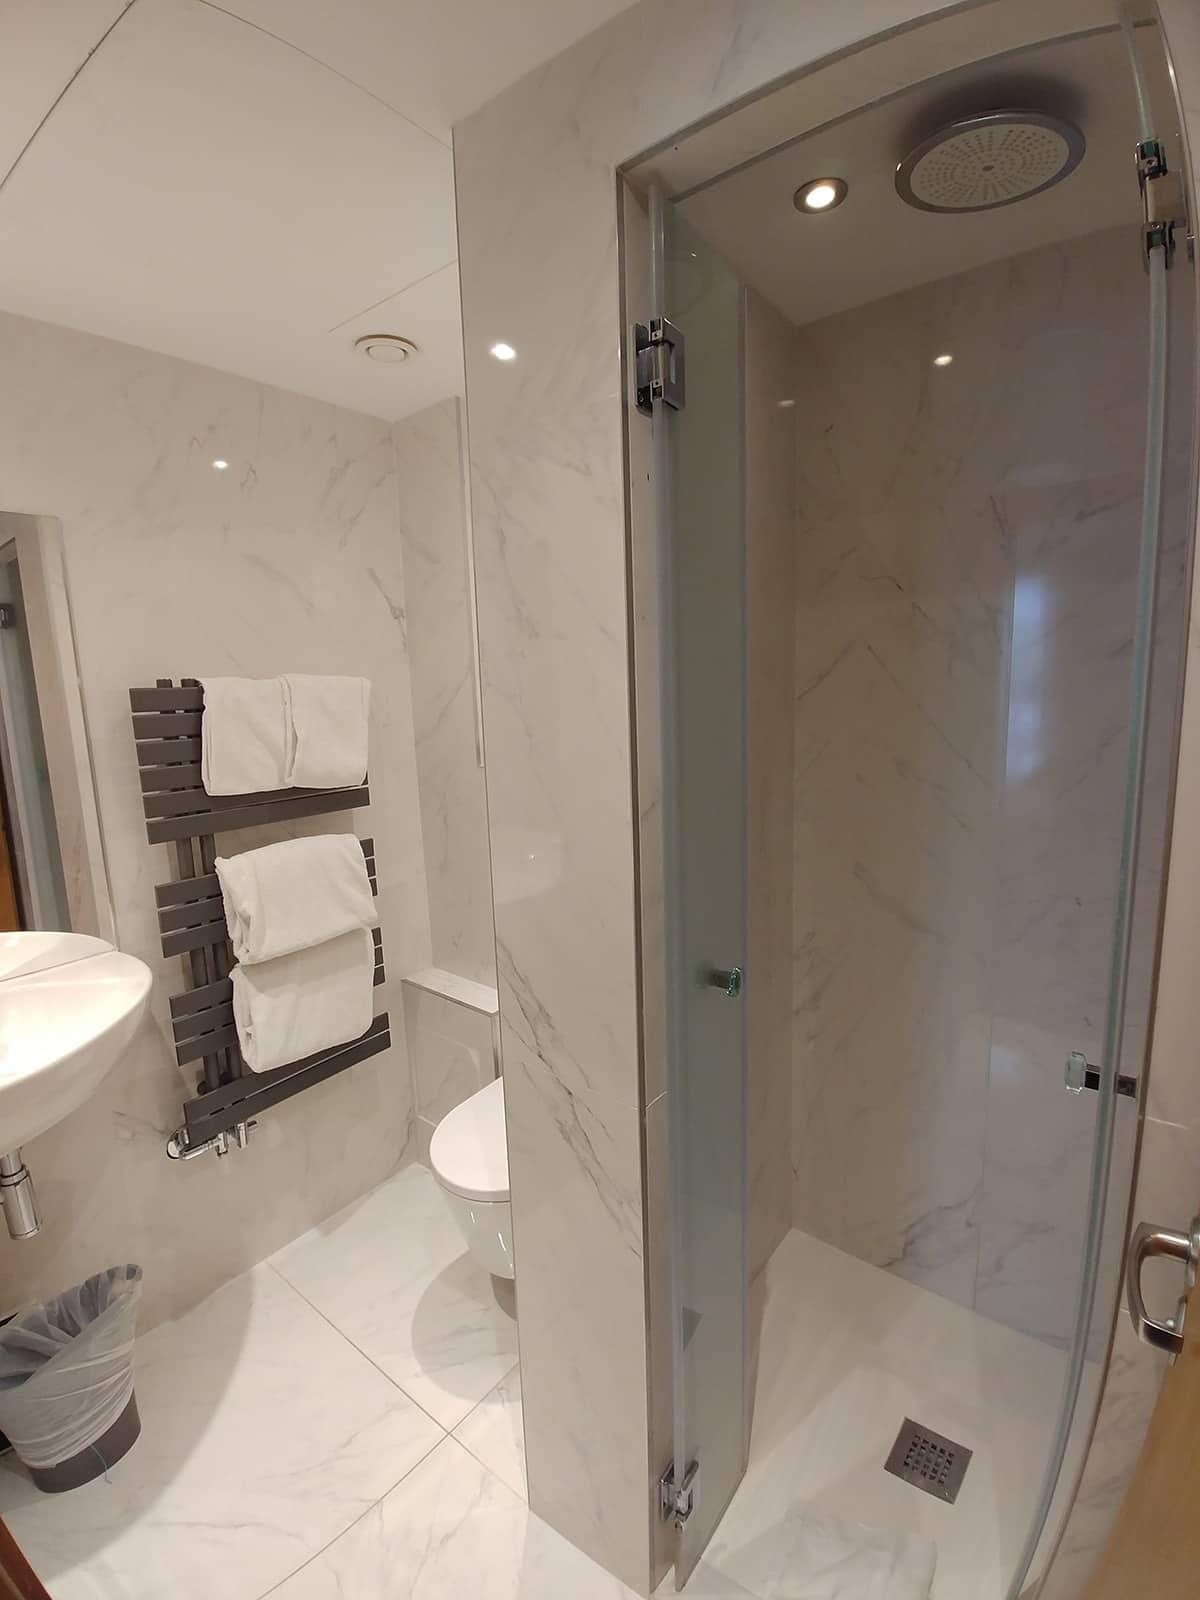 AO bathroom 1 HD